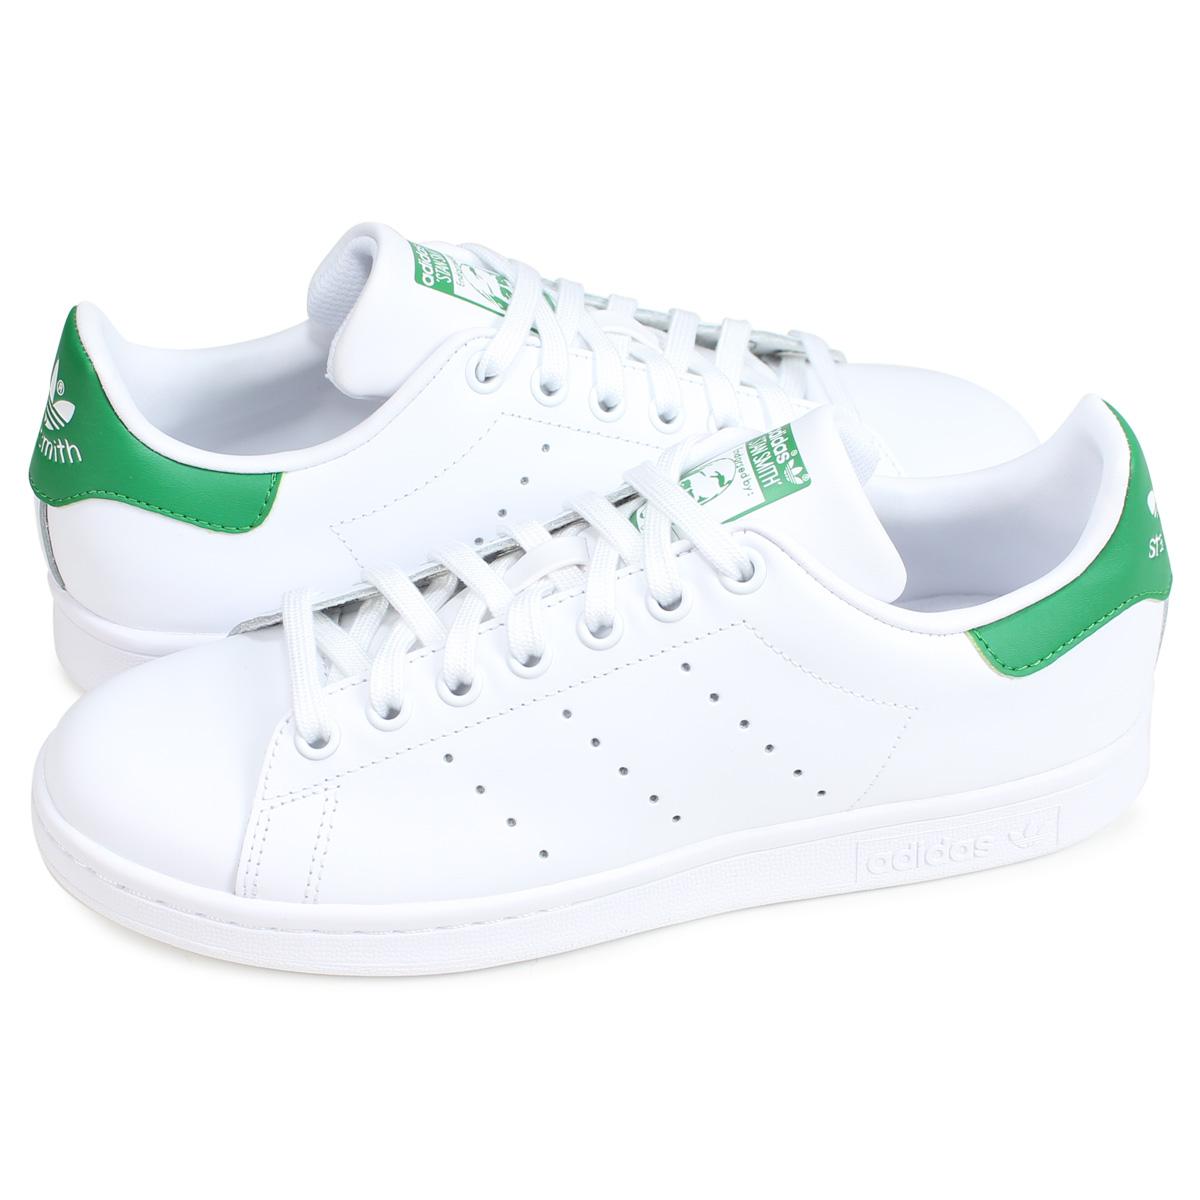 watch c319b c21f7 adidas Originals STAN SMITH W Adidas originals Stan Smith sneakers Lady's  white white B24105 [196]